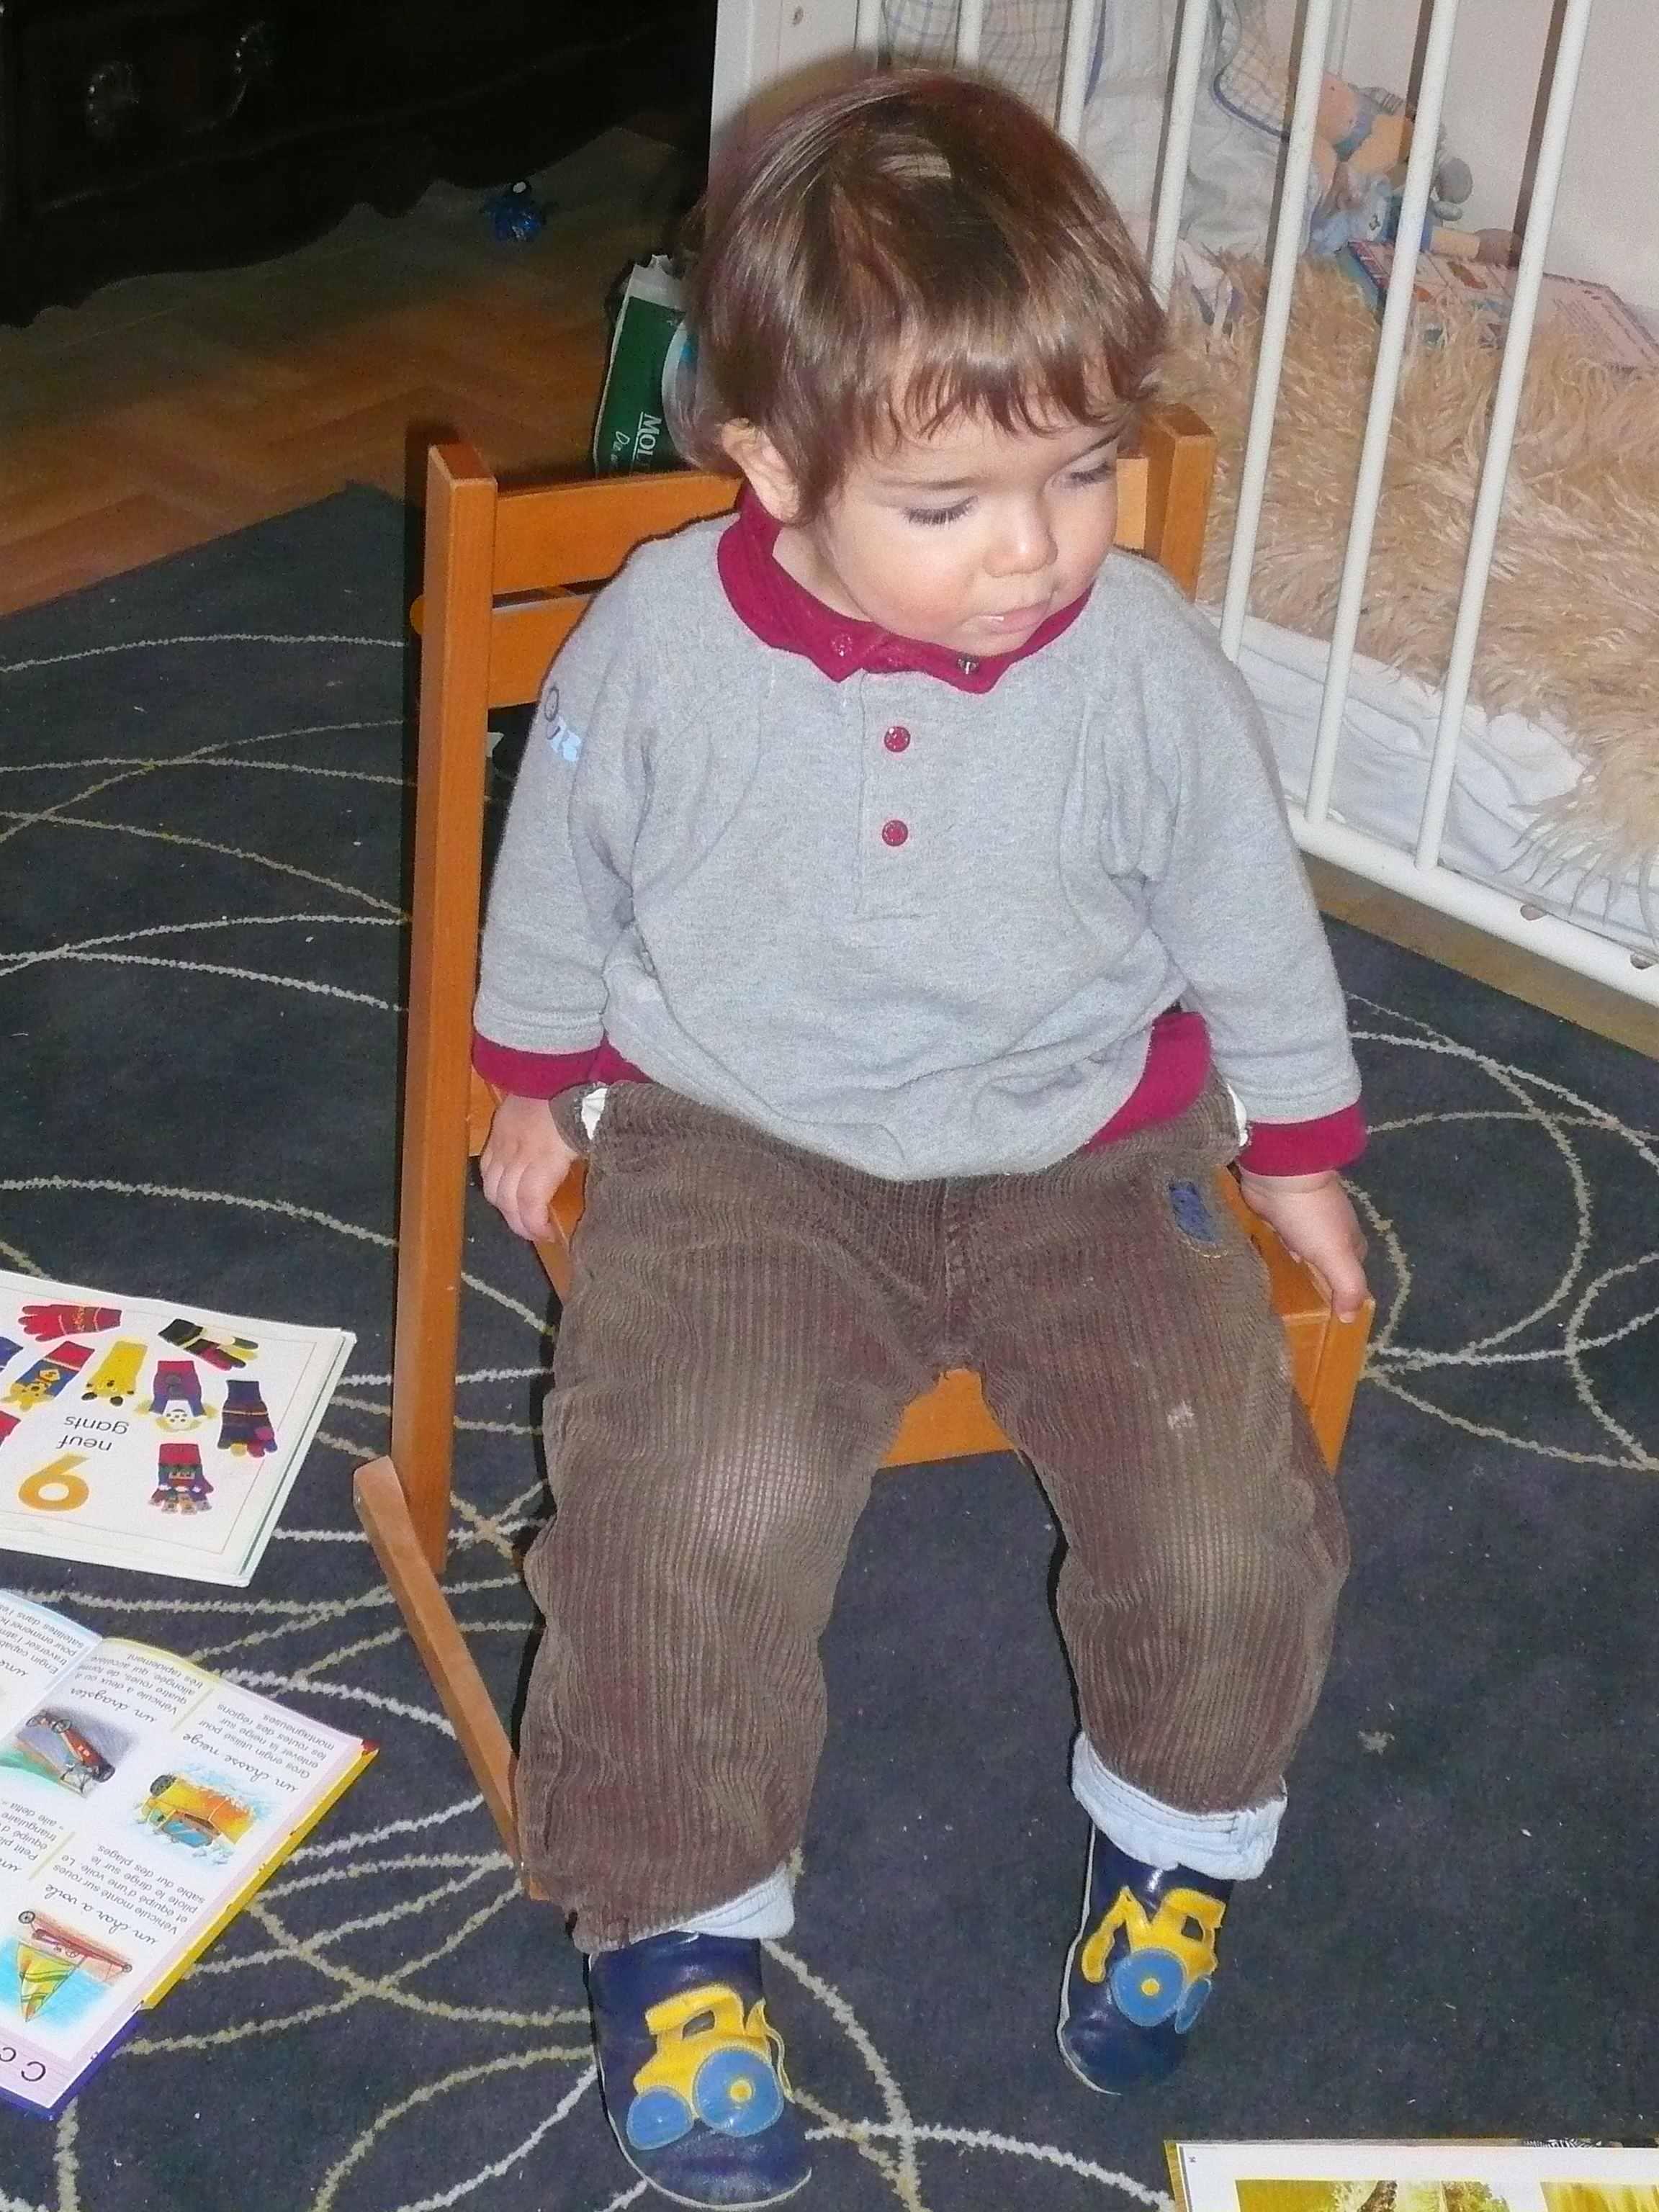 Changer l environnement blog b b montessori - Chaise berceuse pour bebe ...